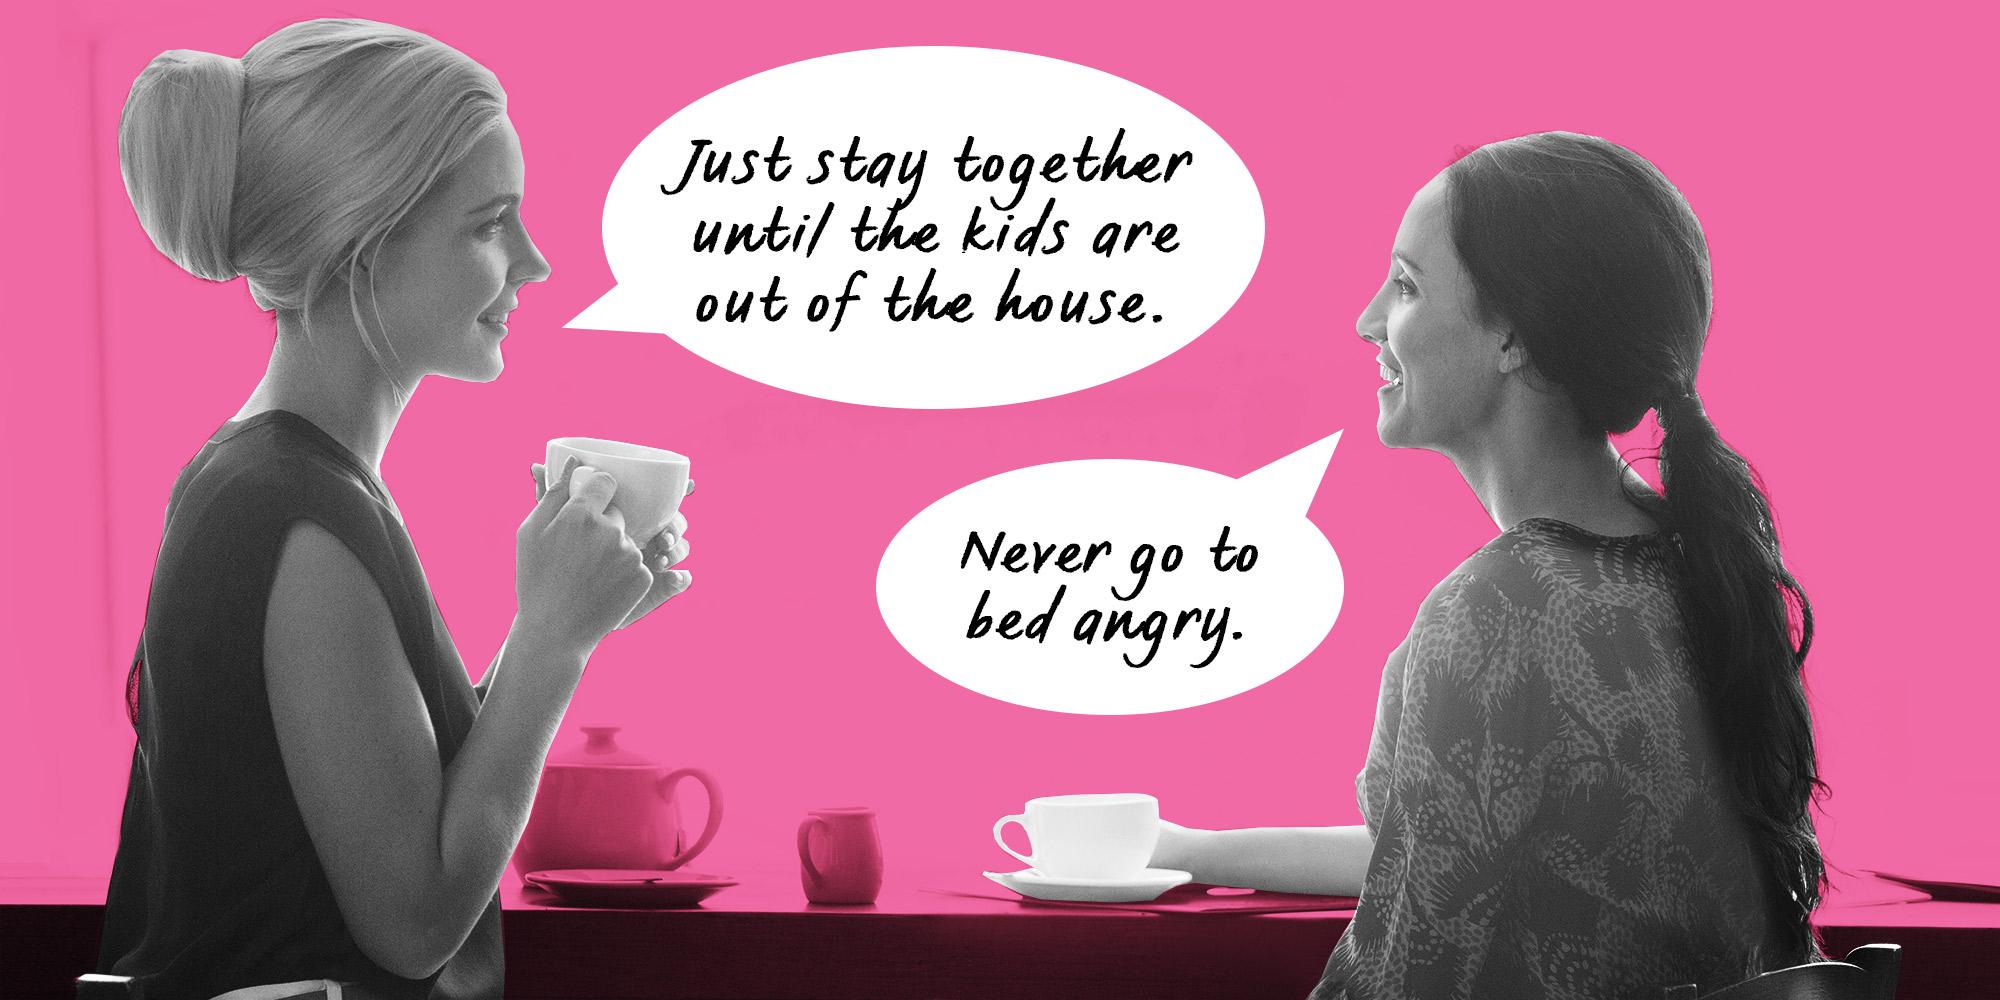 relationship advice should